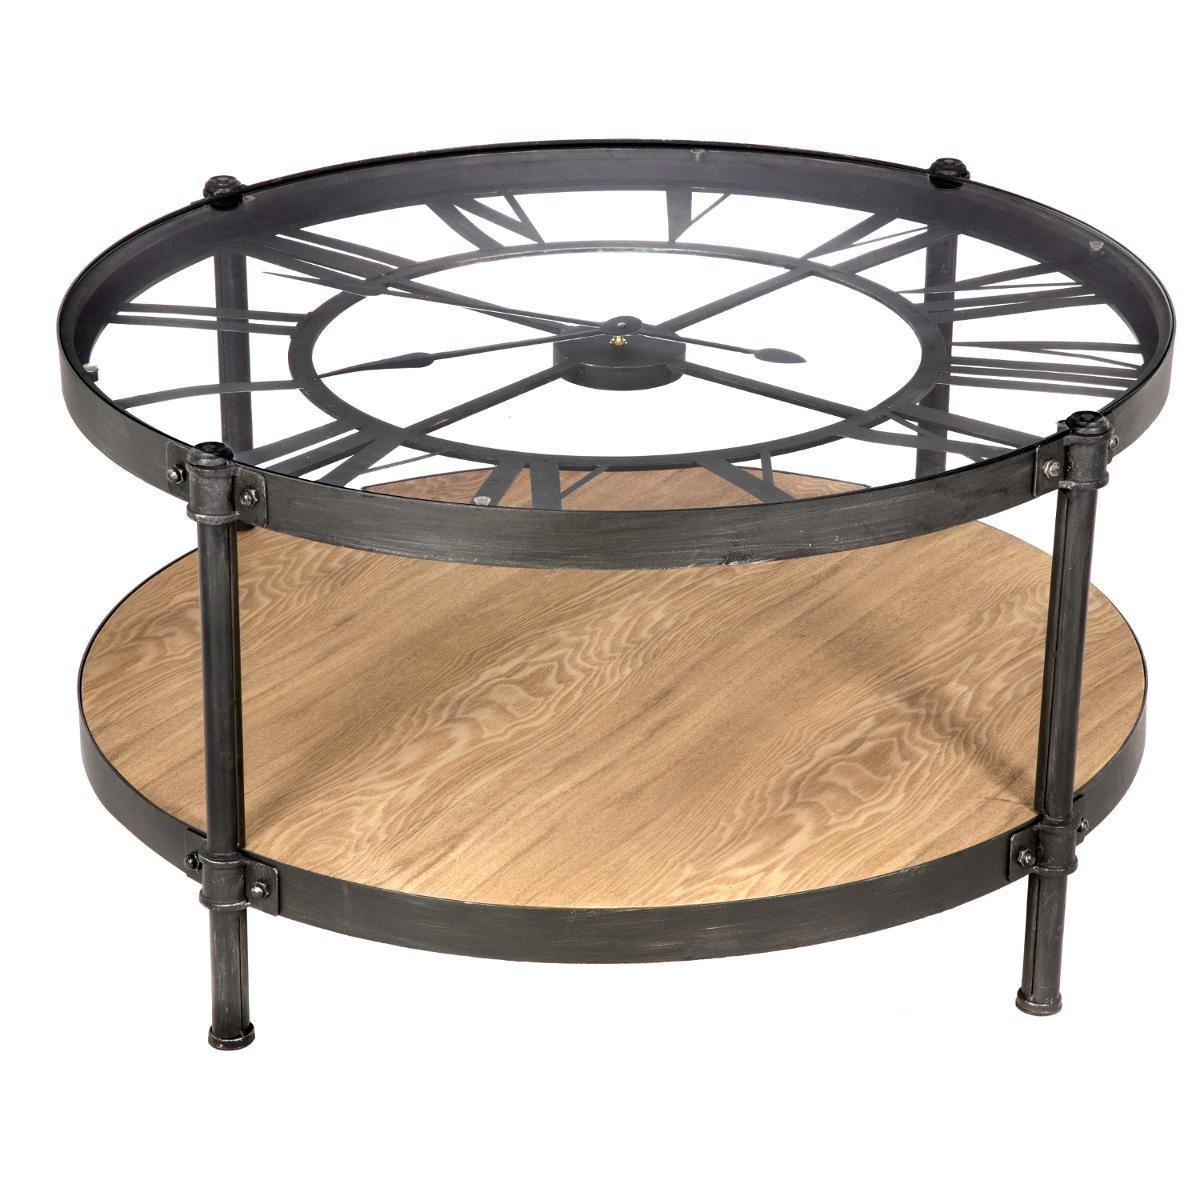 TABLE BASSE CHRONO